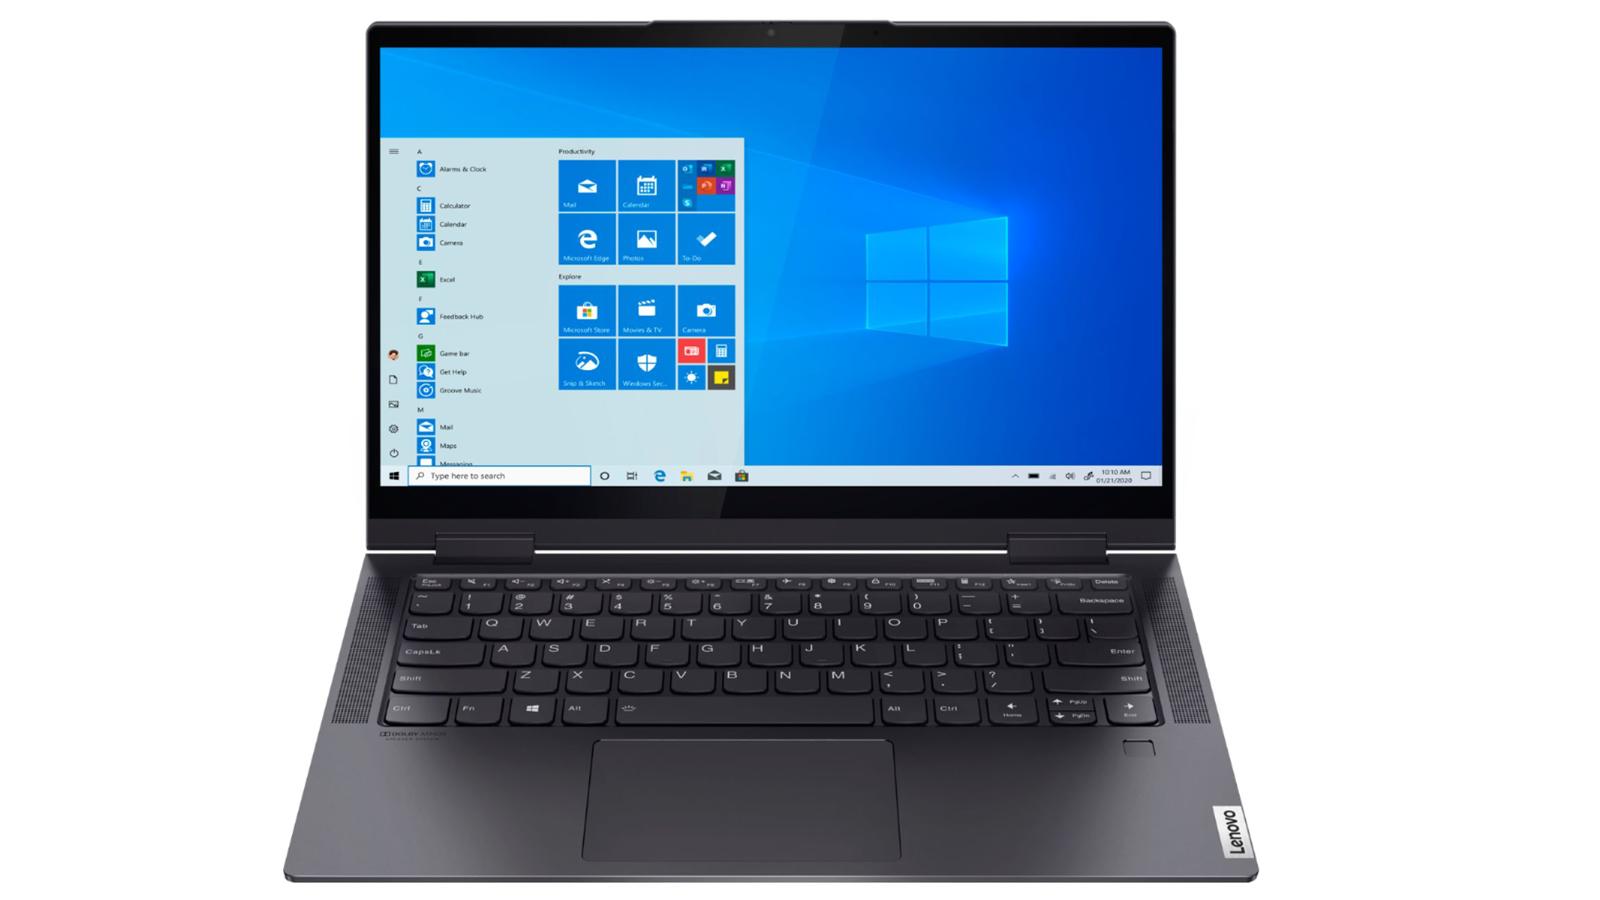 Lenovo Yoga 7i 14-inch 2-in-1 Touchscreen Laptop